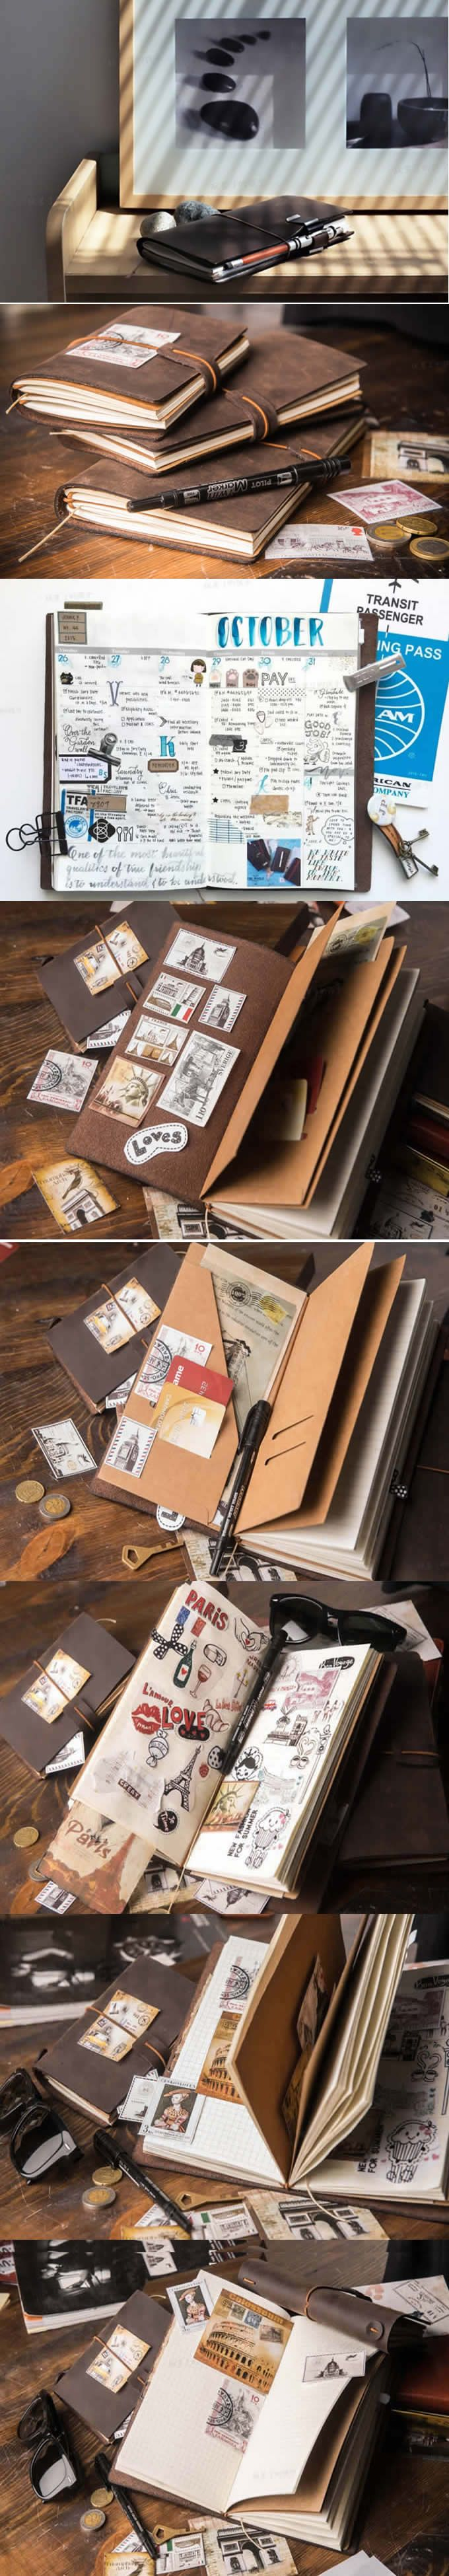 Handmade Classic Genuine Leather Traveler's Notebook